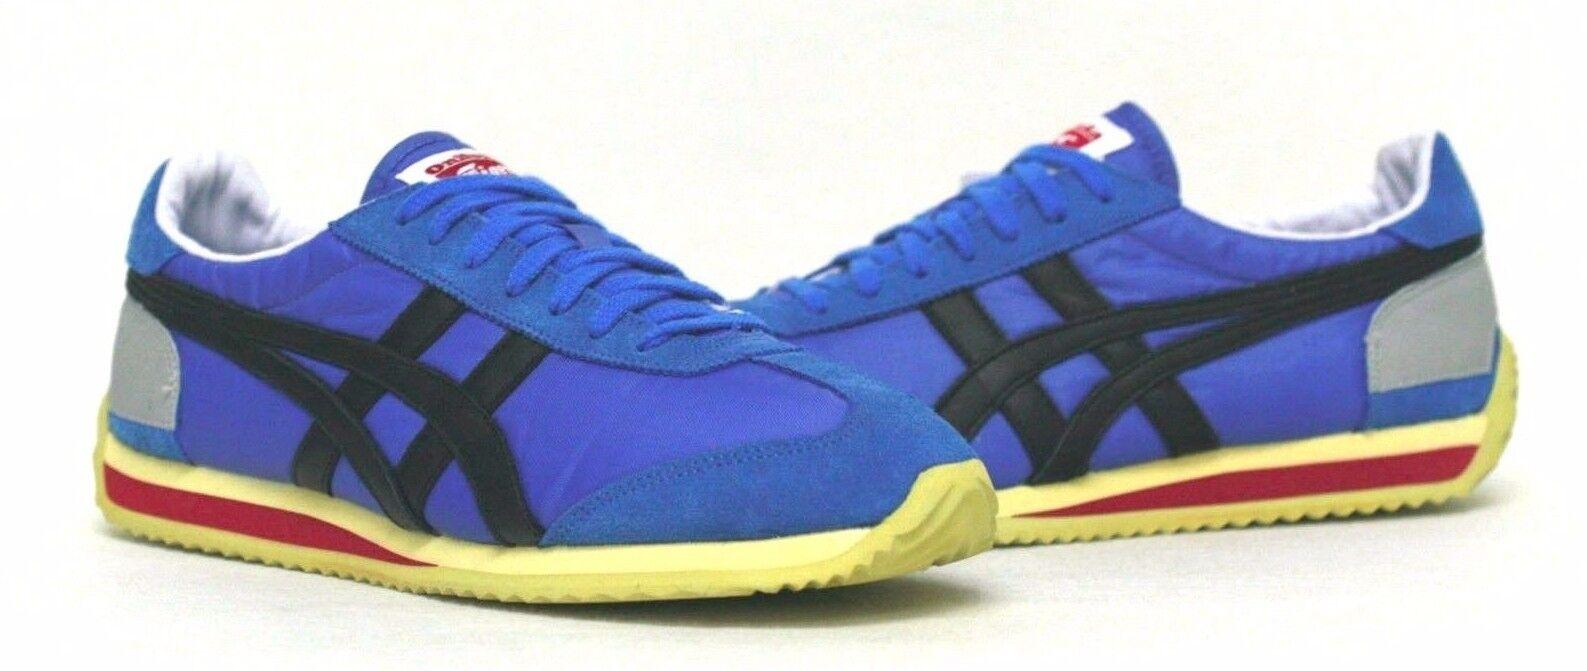 Asics Men's Shoes Onitsuka Tiger California 78 Vin D110N-4290 Men's Sz 5,5.5,8.5